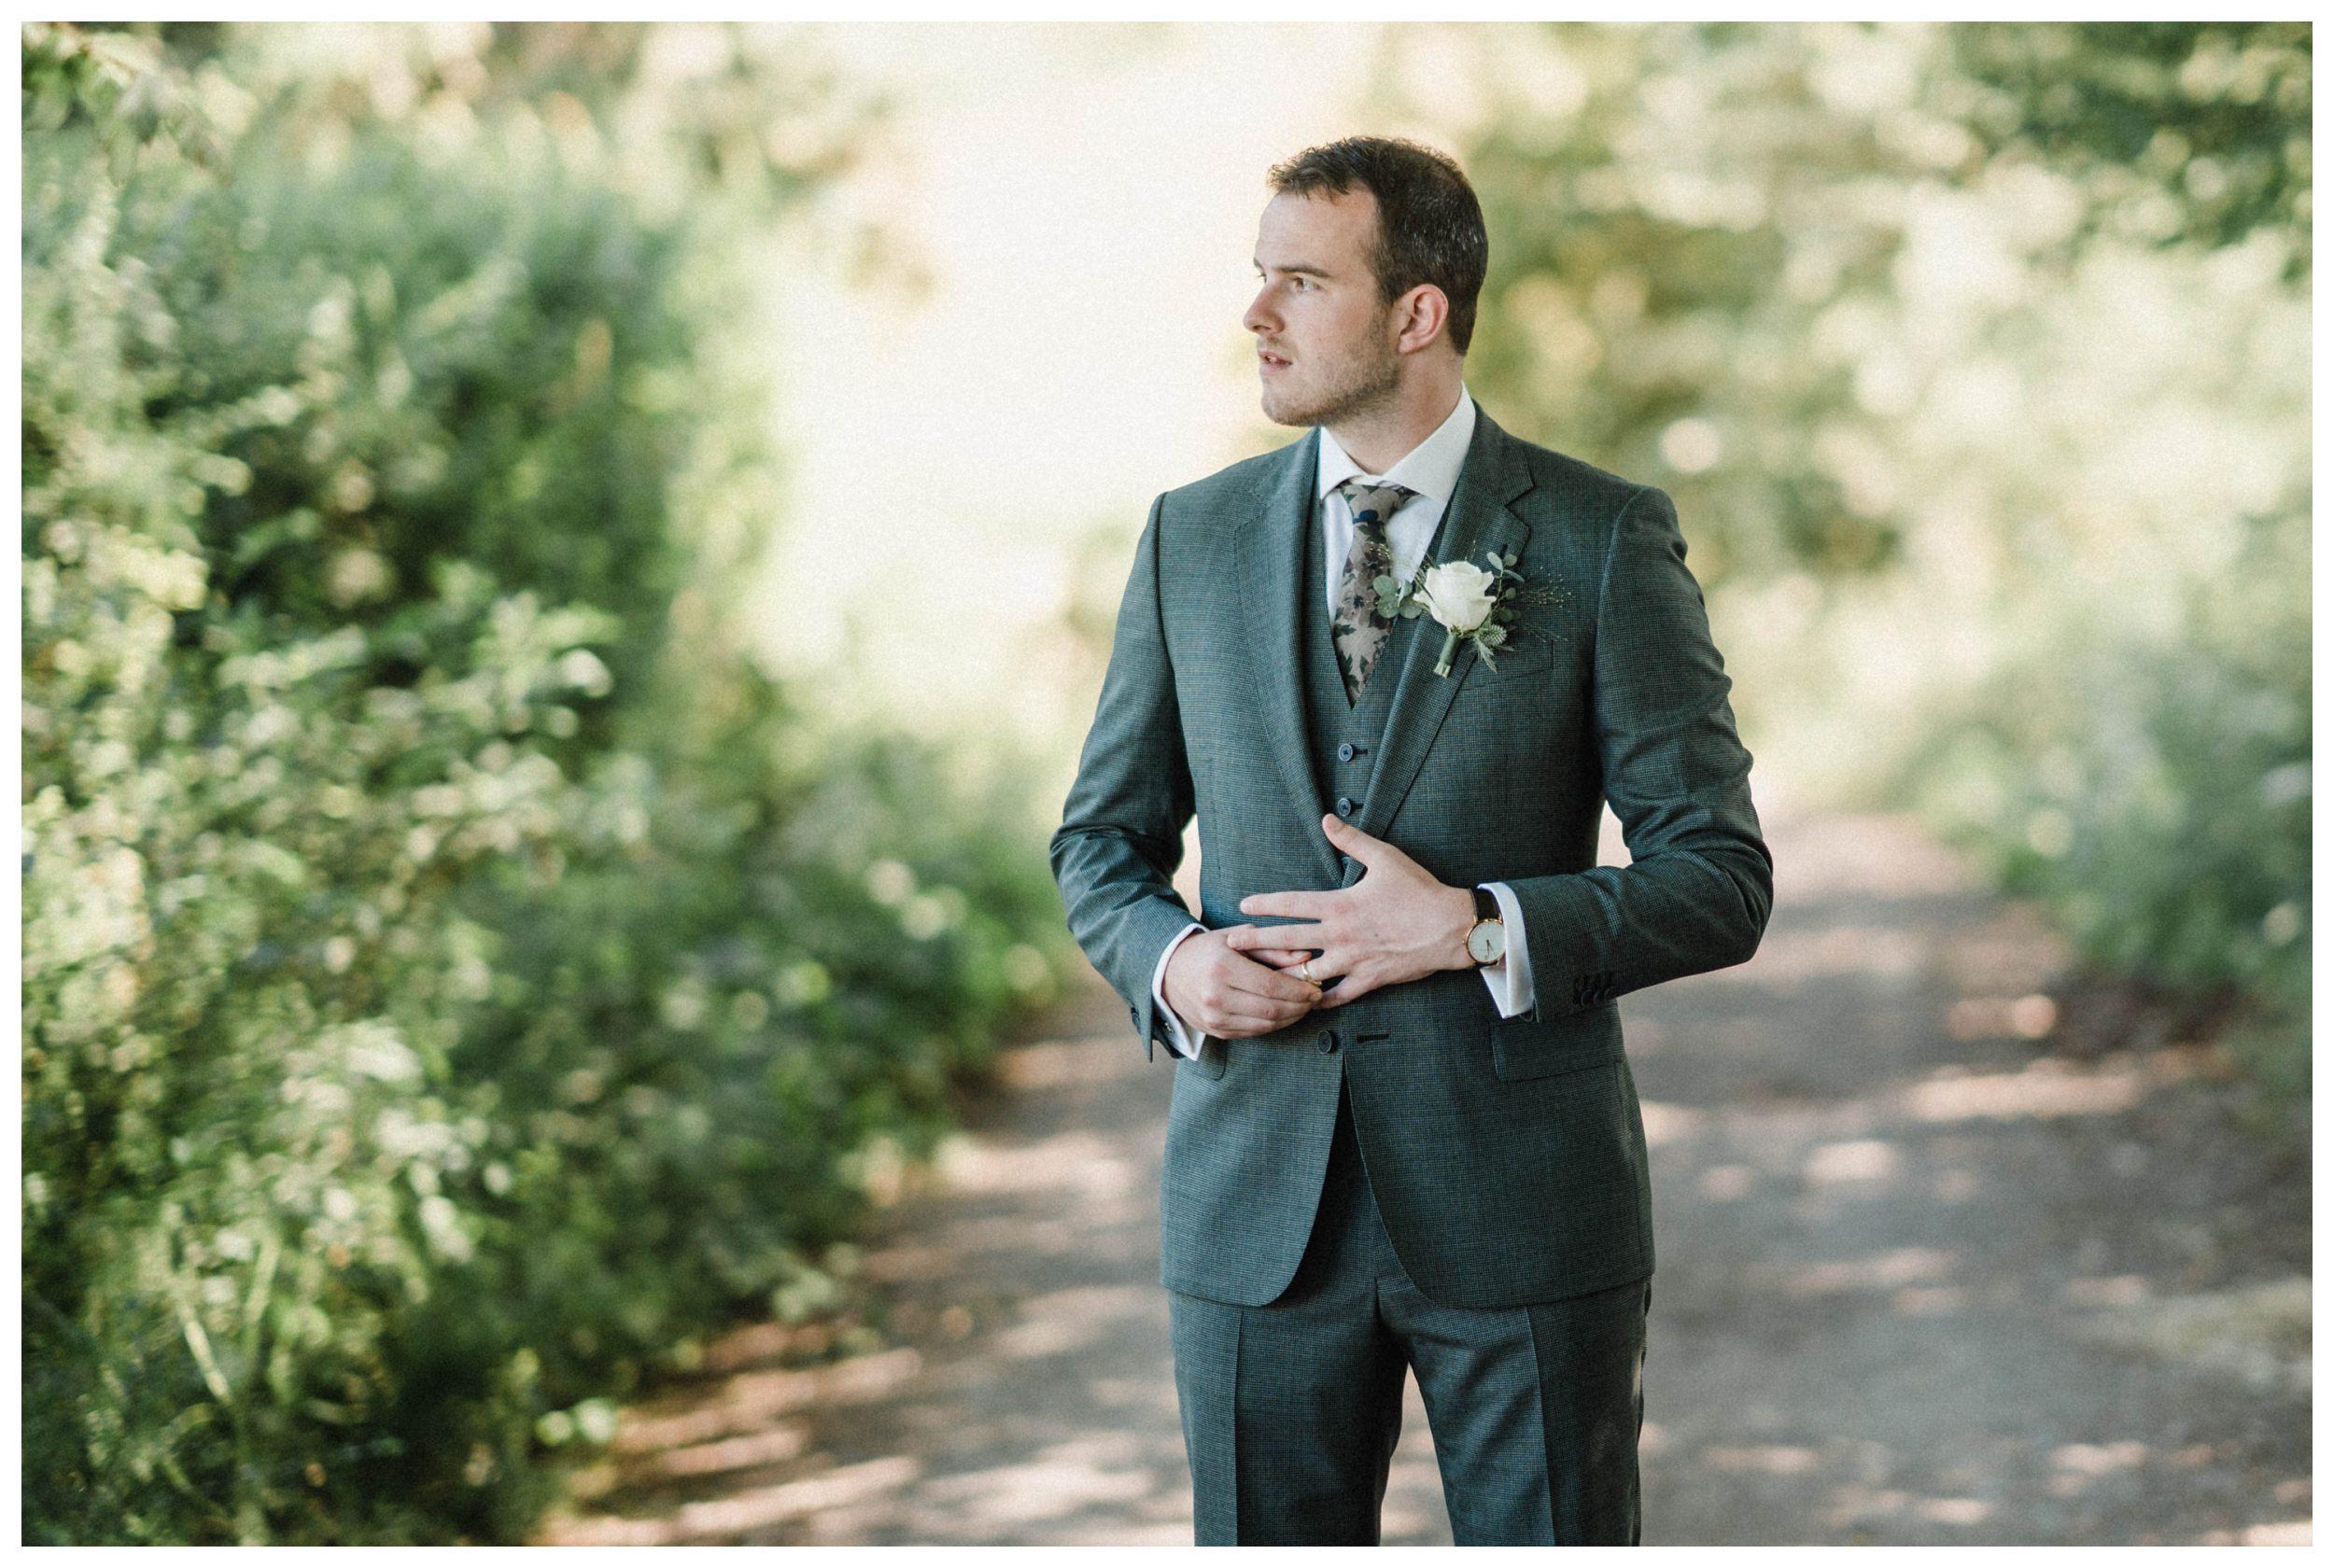 huwelijksfotograaf bruidsfotograaf destinationwedding huwelijksfotografie in ardennen nederland (40).jpg